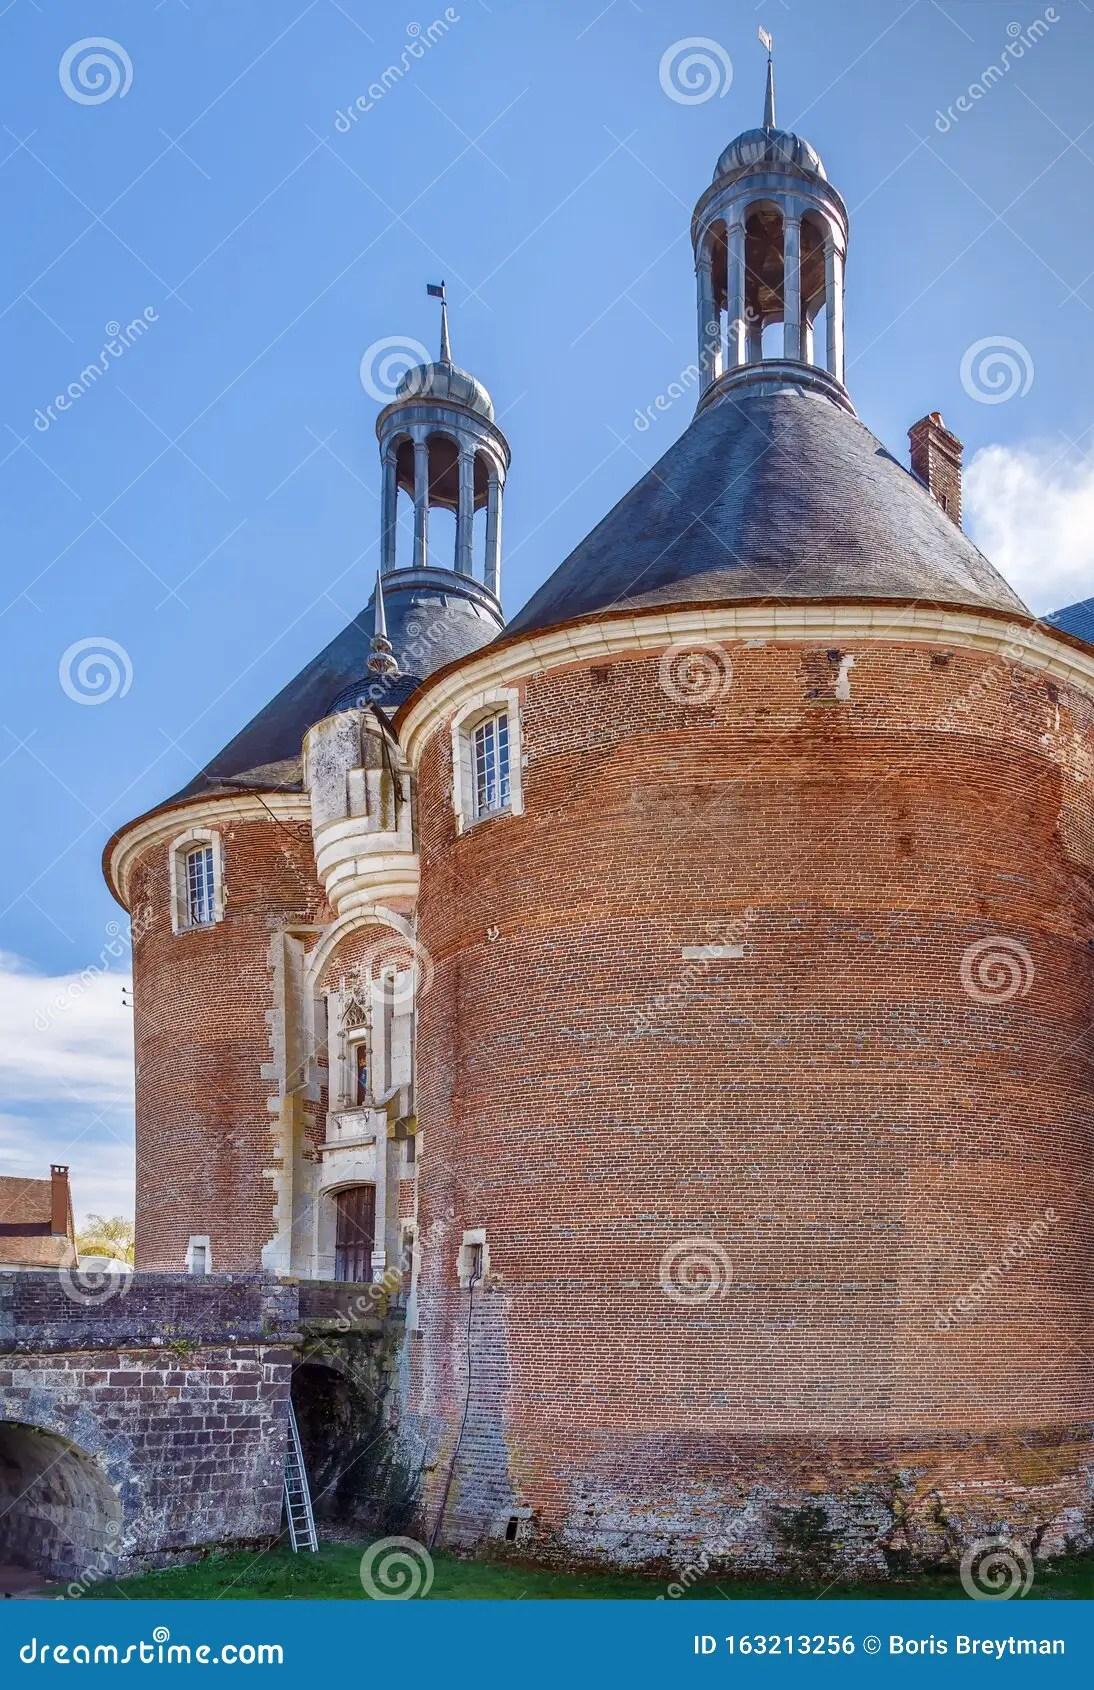 Château De Saint-fargeau : château, saint-fargeau, Castle, Saint-Fargeau,, France, Stock, Photo, Image, Landmark,, Monument:, 163213256